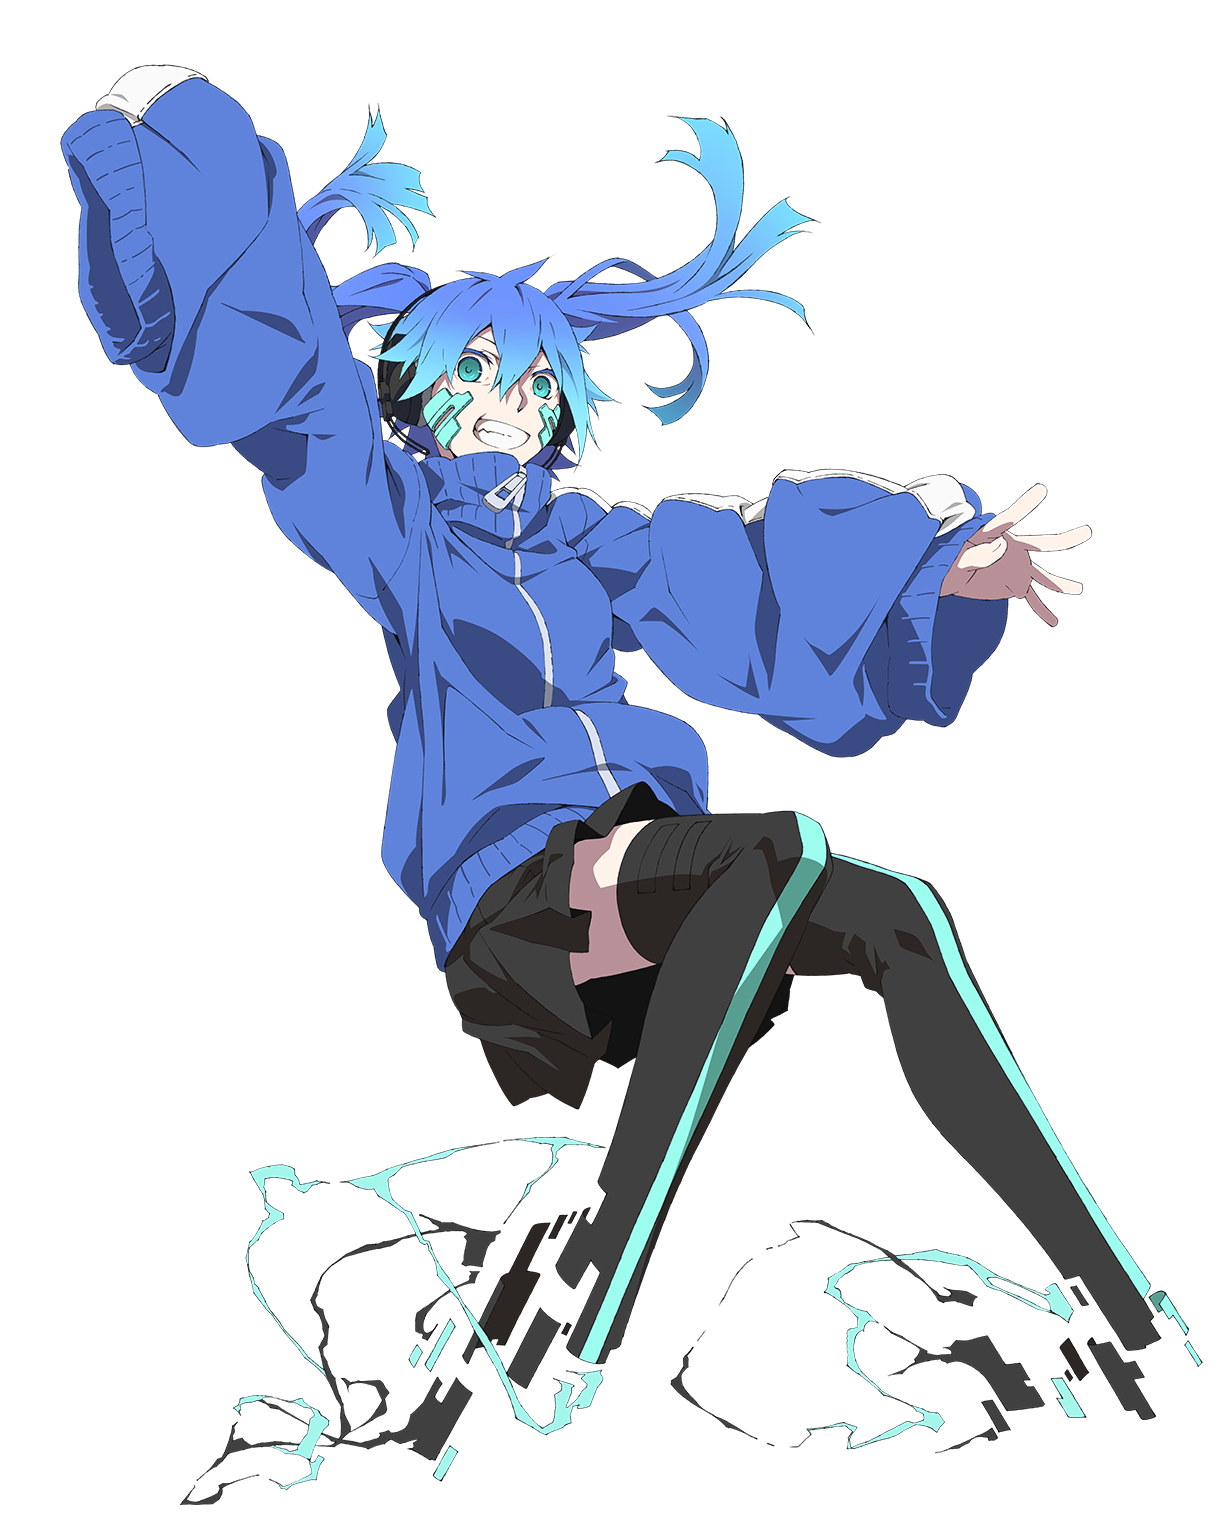 http://ami.animecharactersdatabase.com/uploads/chars/11498-1806526446.png